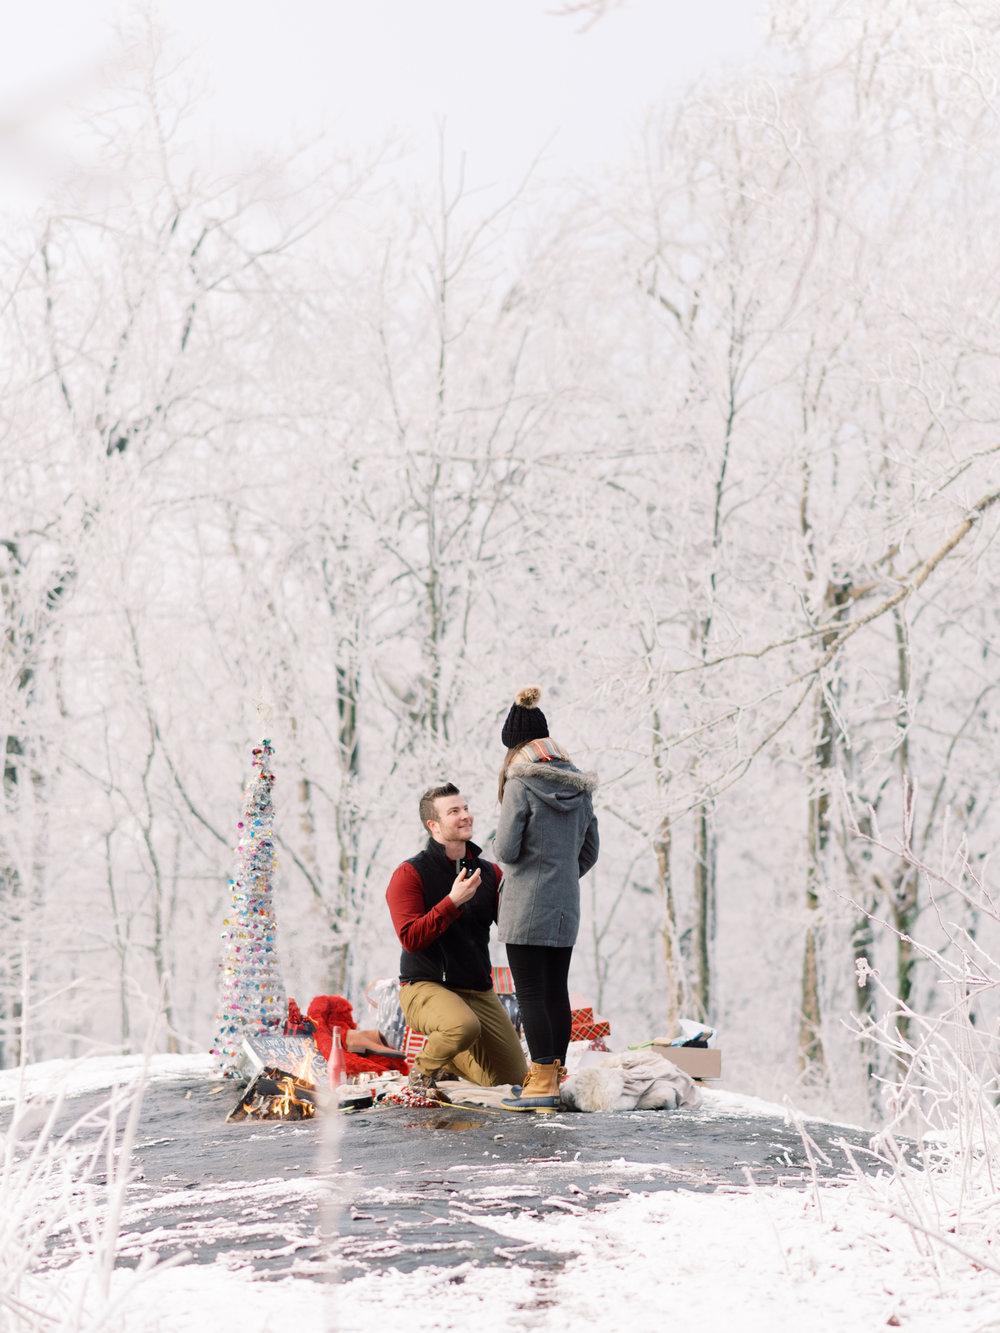 snowy-georgia-proposal-preachers-rock-atlanta-dahlonega-wedding-photographer-hannah-forsberg-fine-art-film-7.jpg